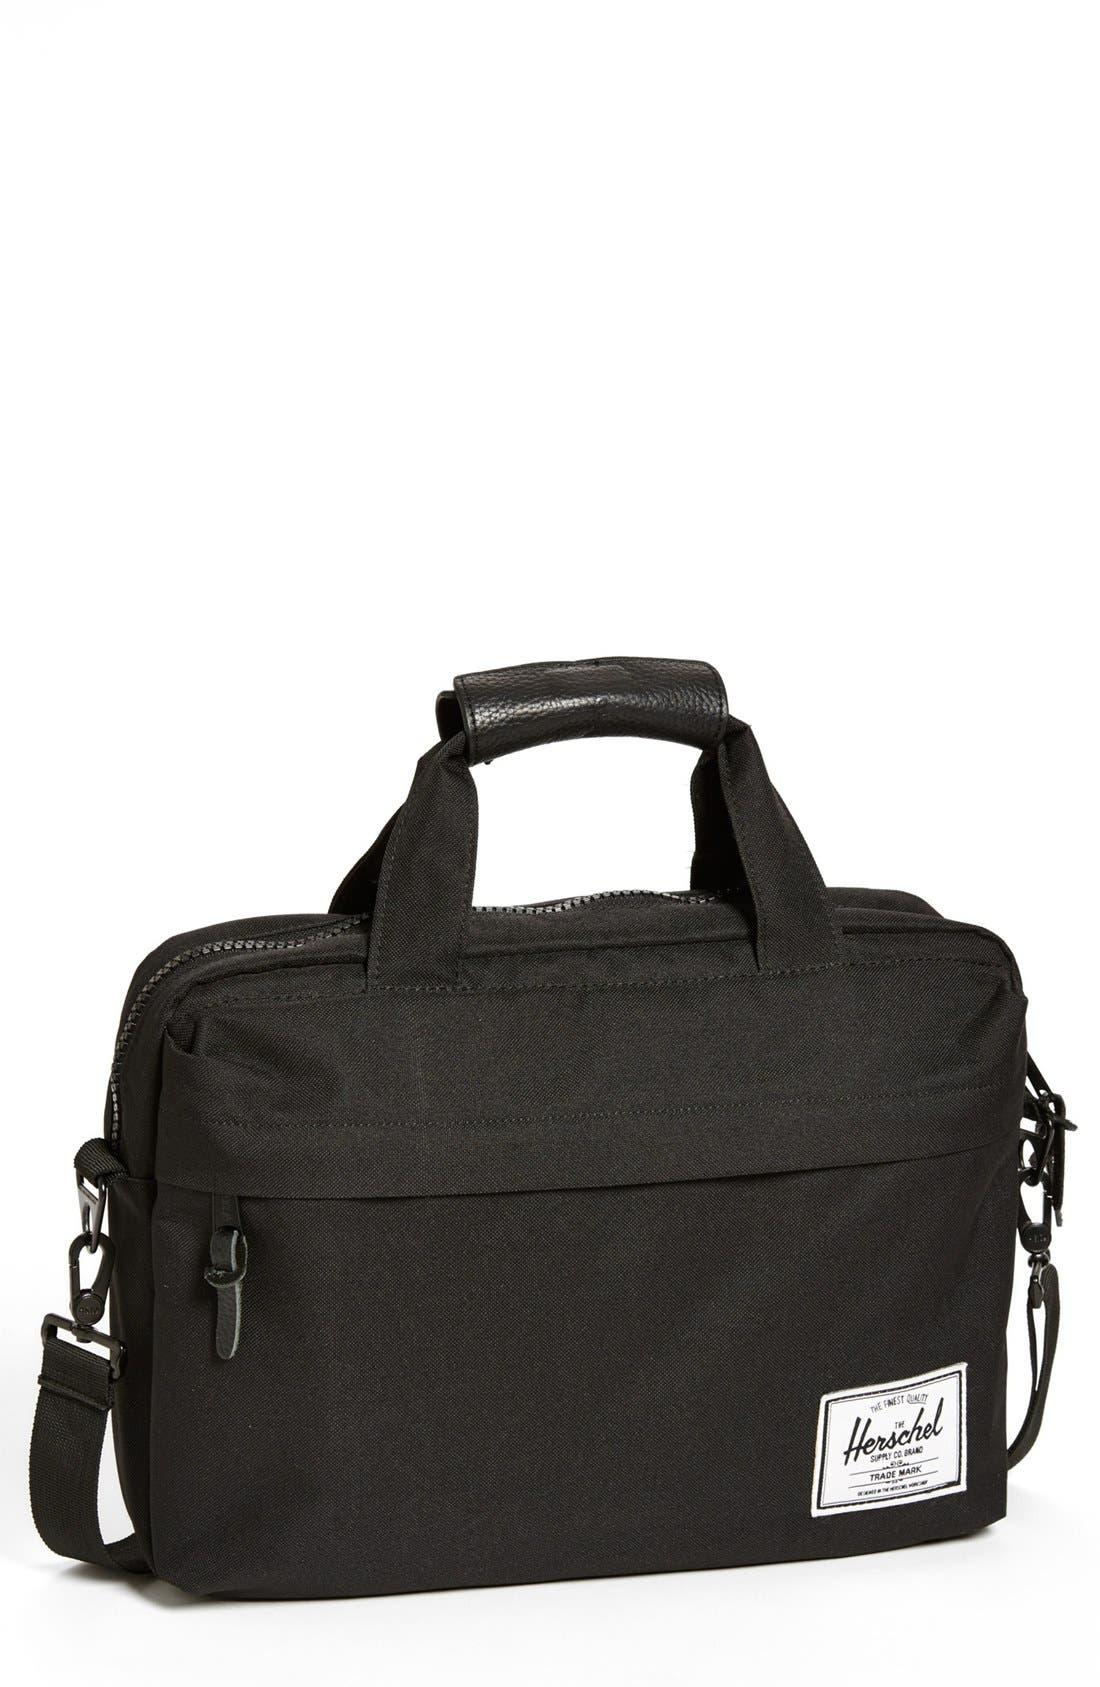 Main Image - Herschel Supply Co. 'Clark' Messenger Bag